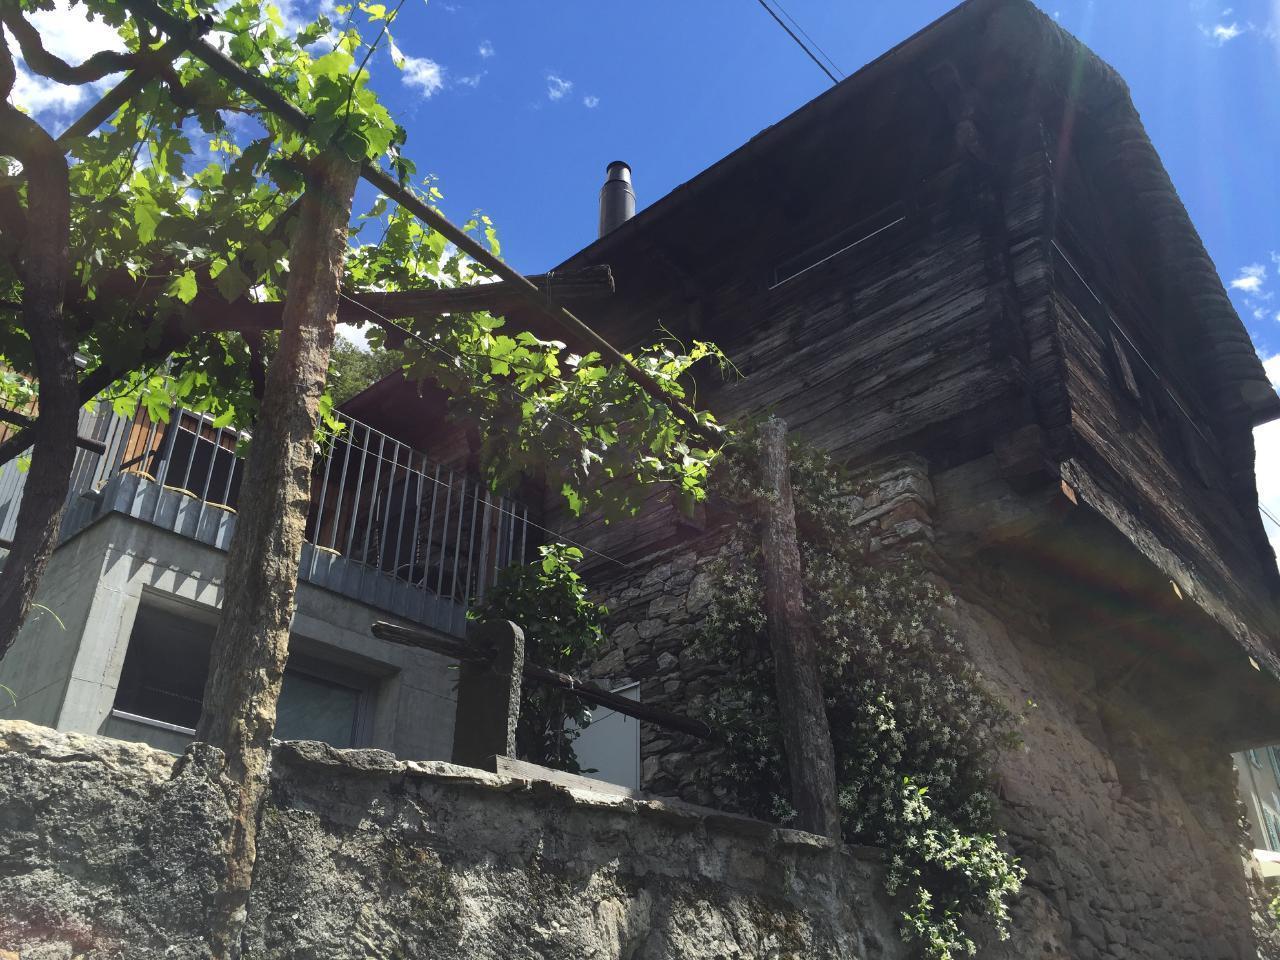 Maison de vacances Malvaglia Chiesa, 500jähriges Valserhaus (1631179), Malvaglia, Vallée de Blenio, Tessin, Suisse, image 26